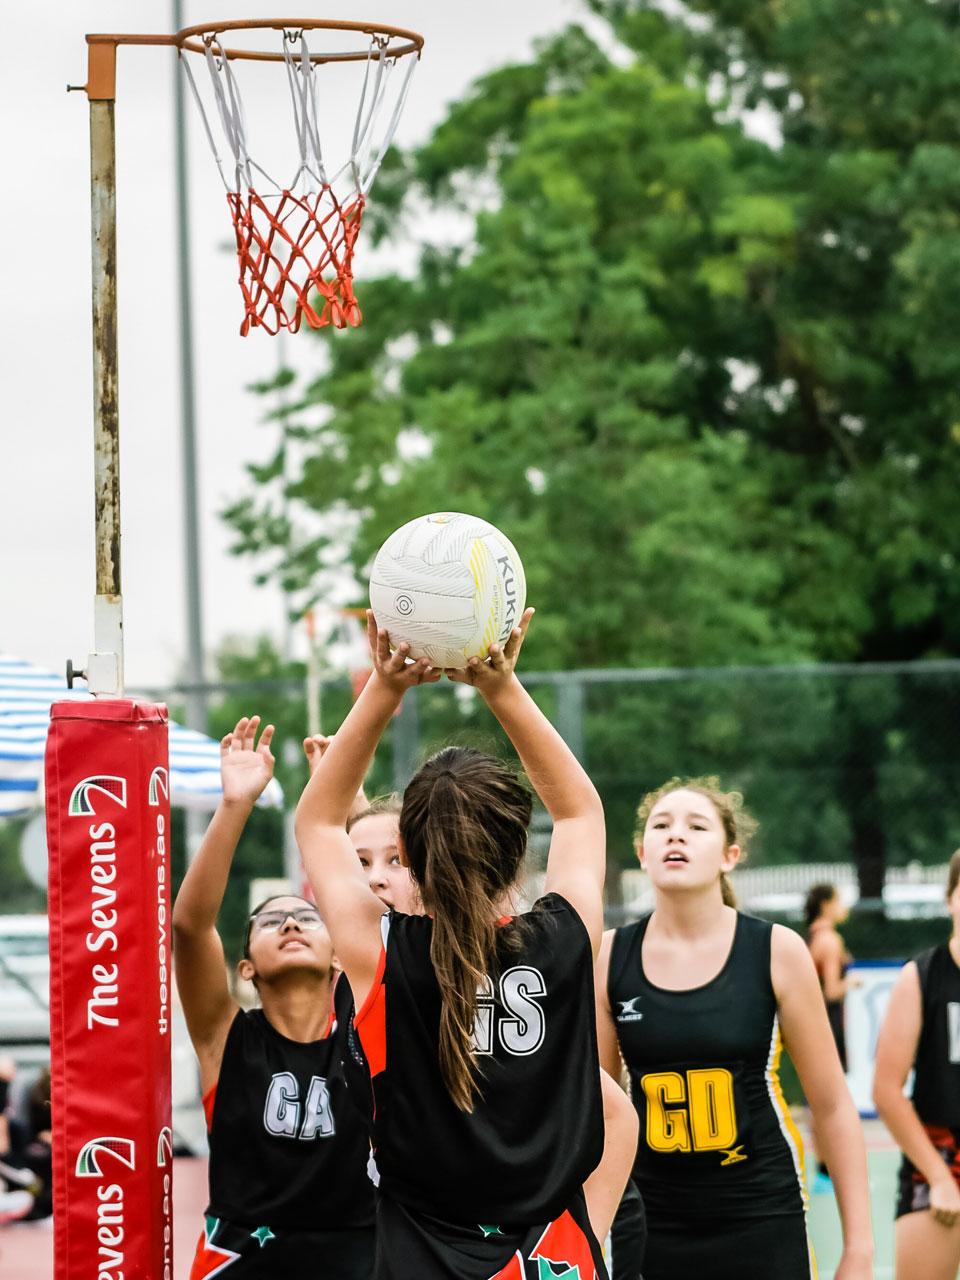 Girl shooting a netball at the Sevens